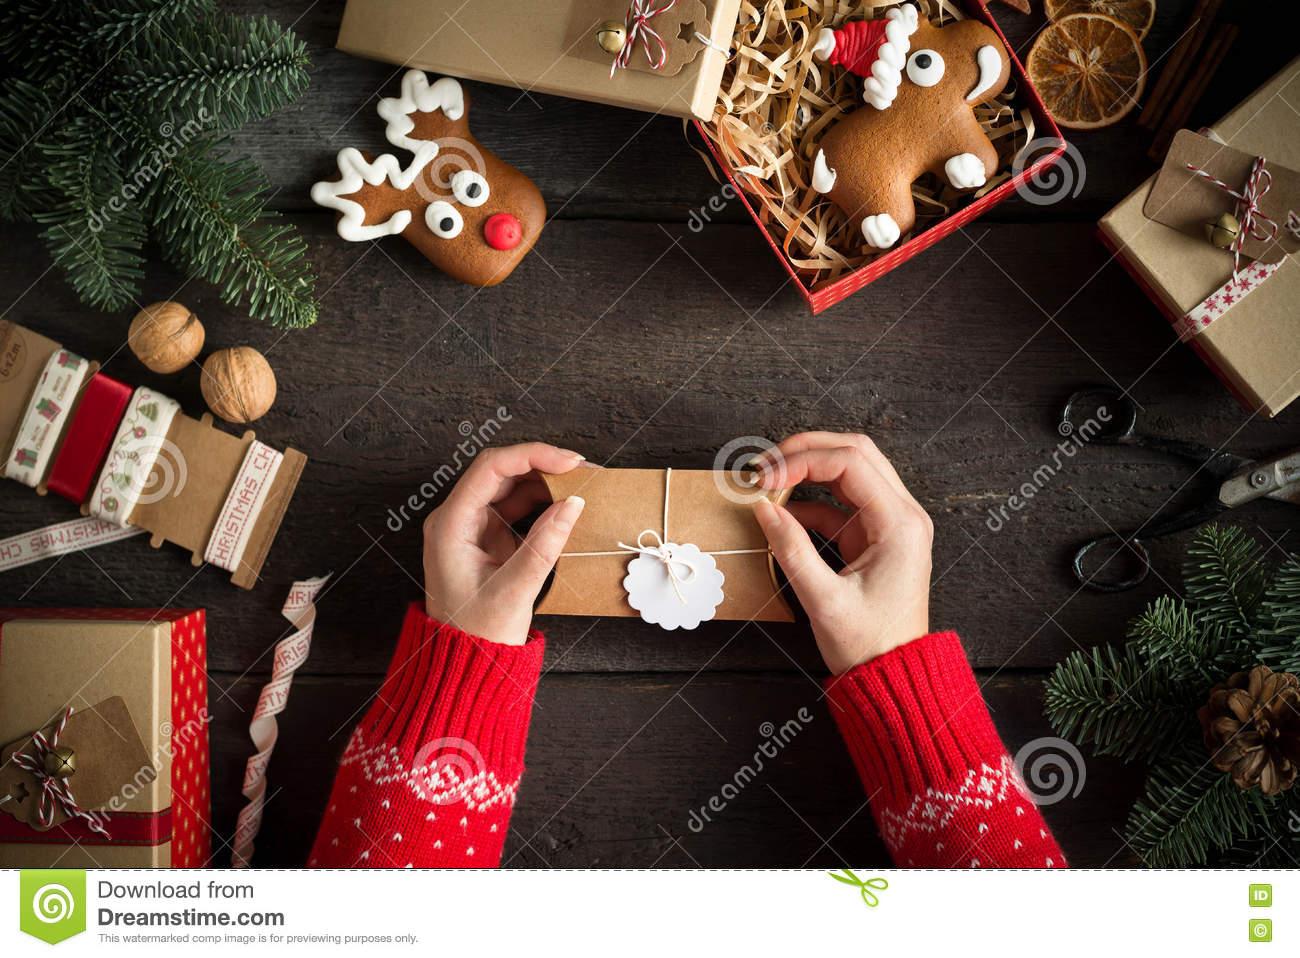 Cadeau noel vide